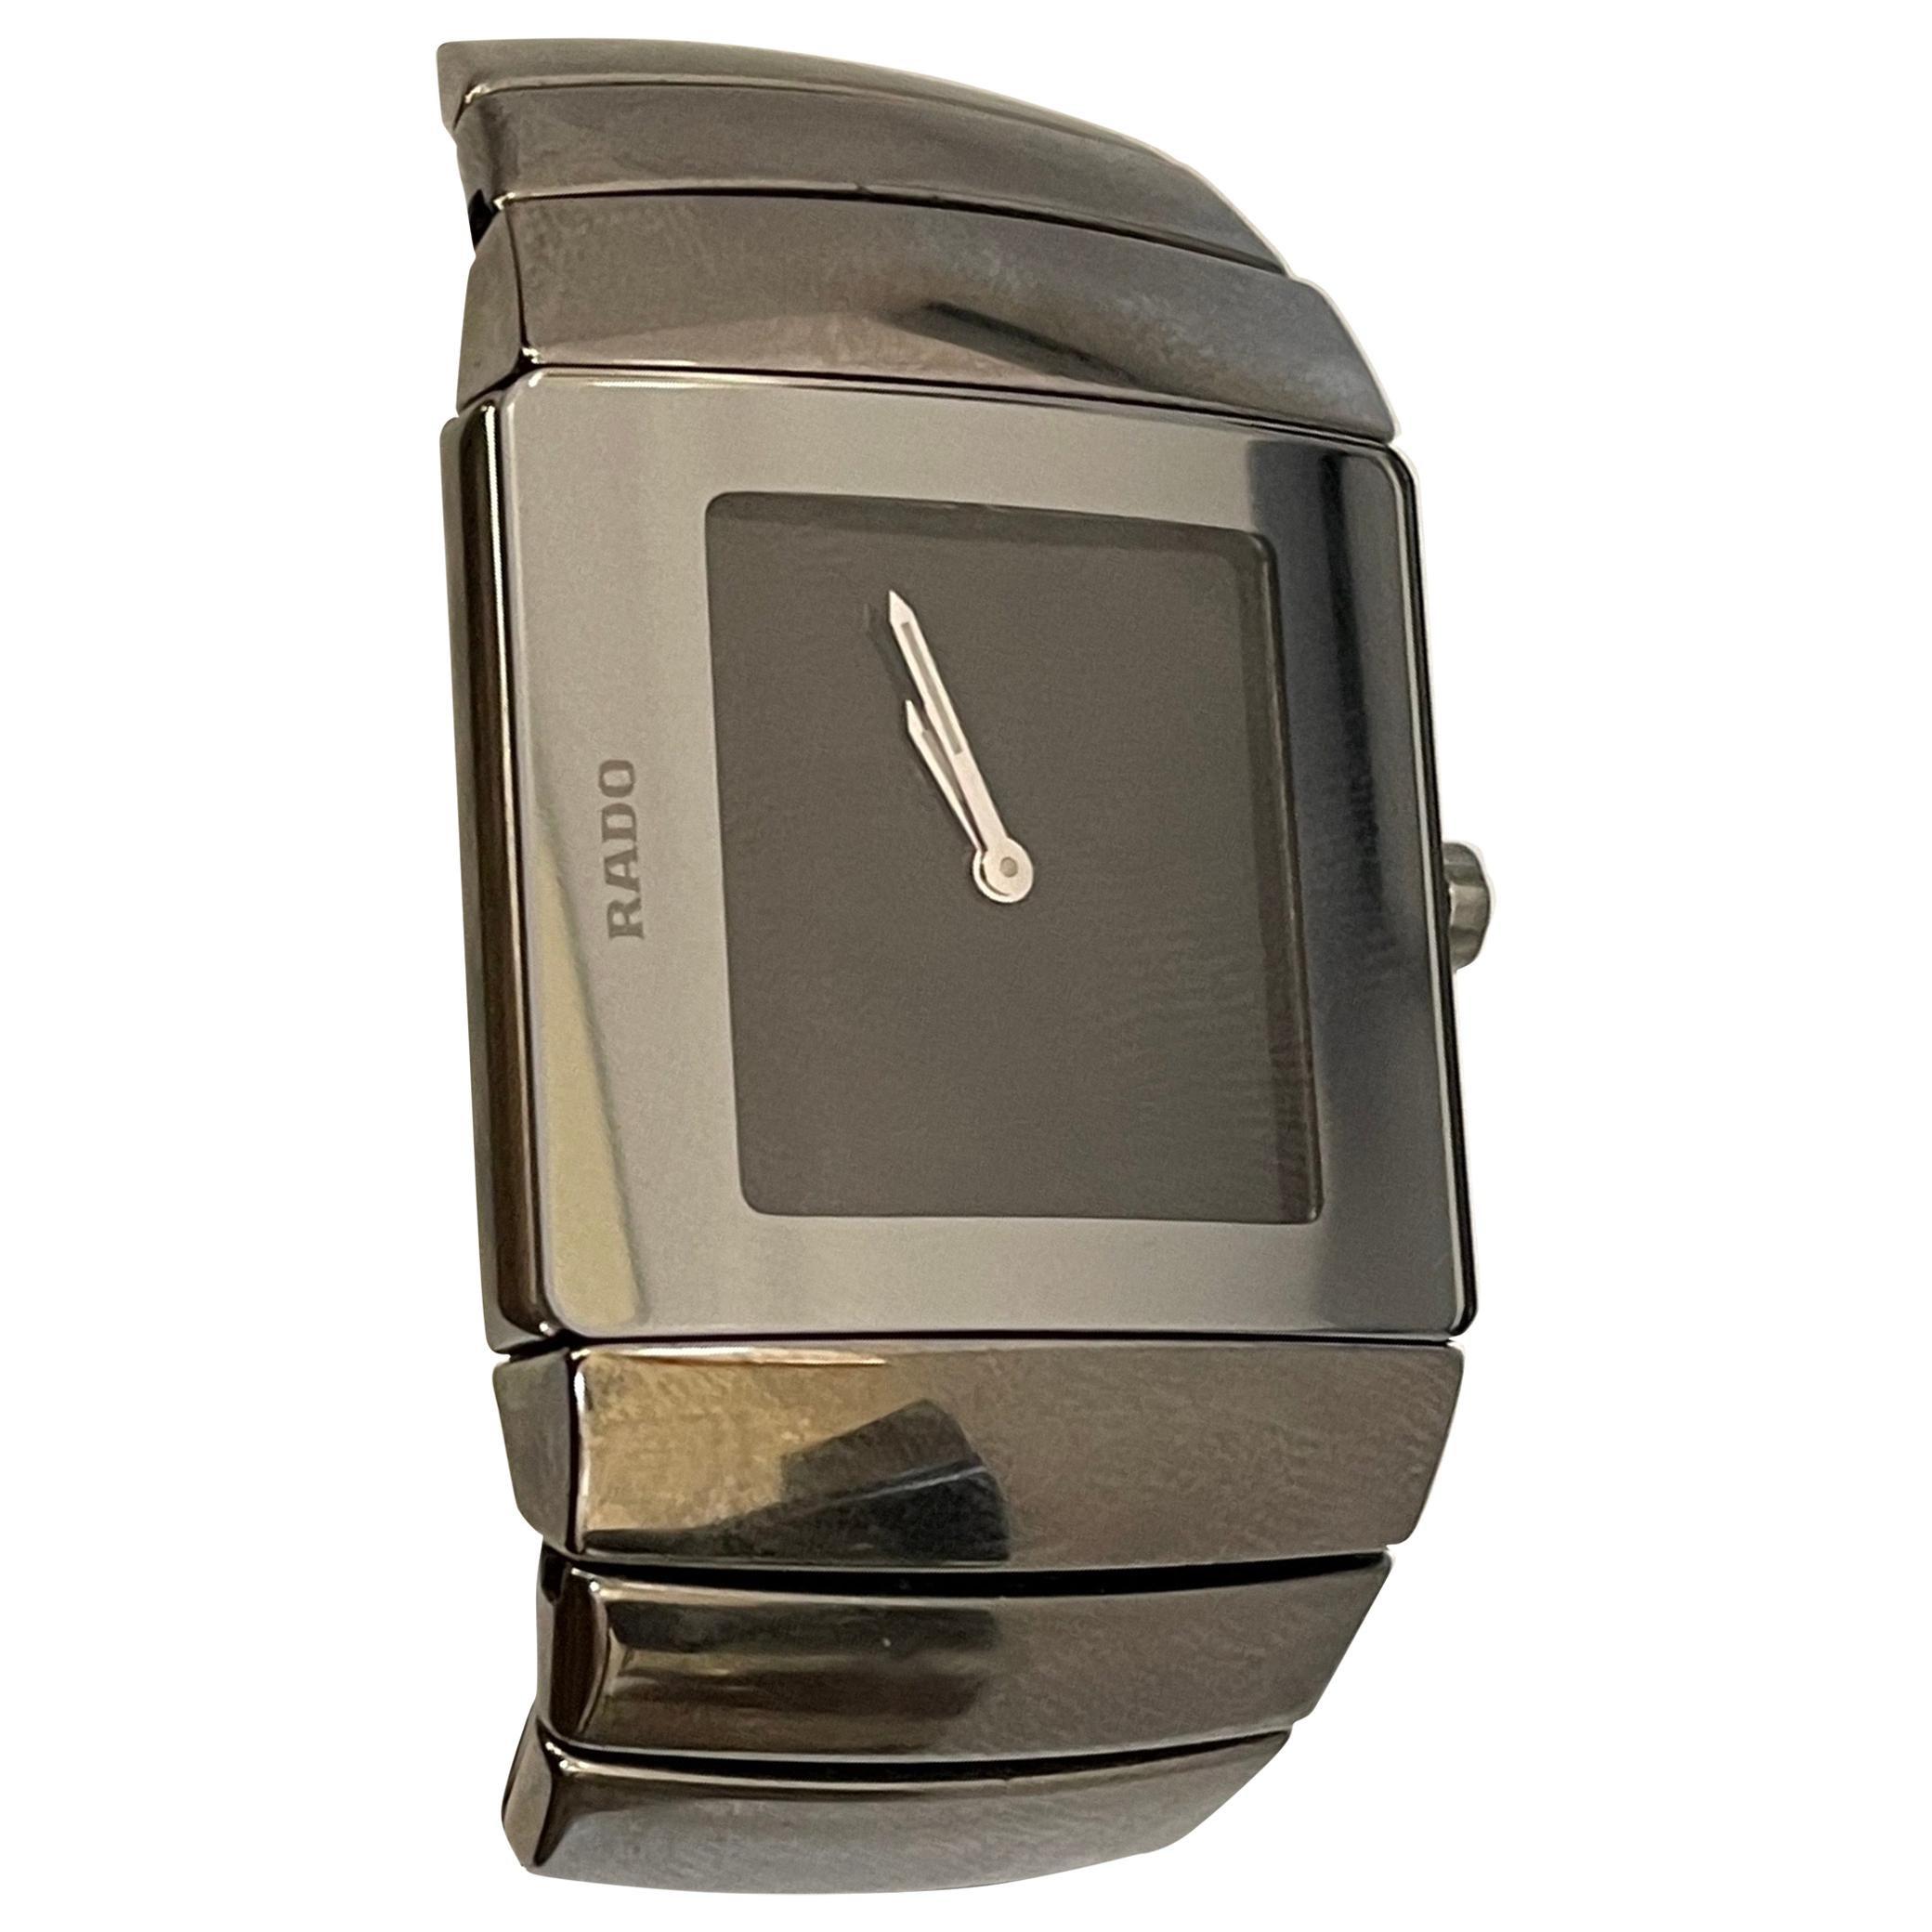 RADO Sintra Jubile Analog/Digital Silver Dial Men's Watch